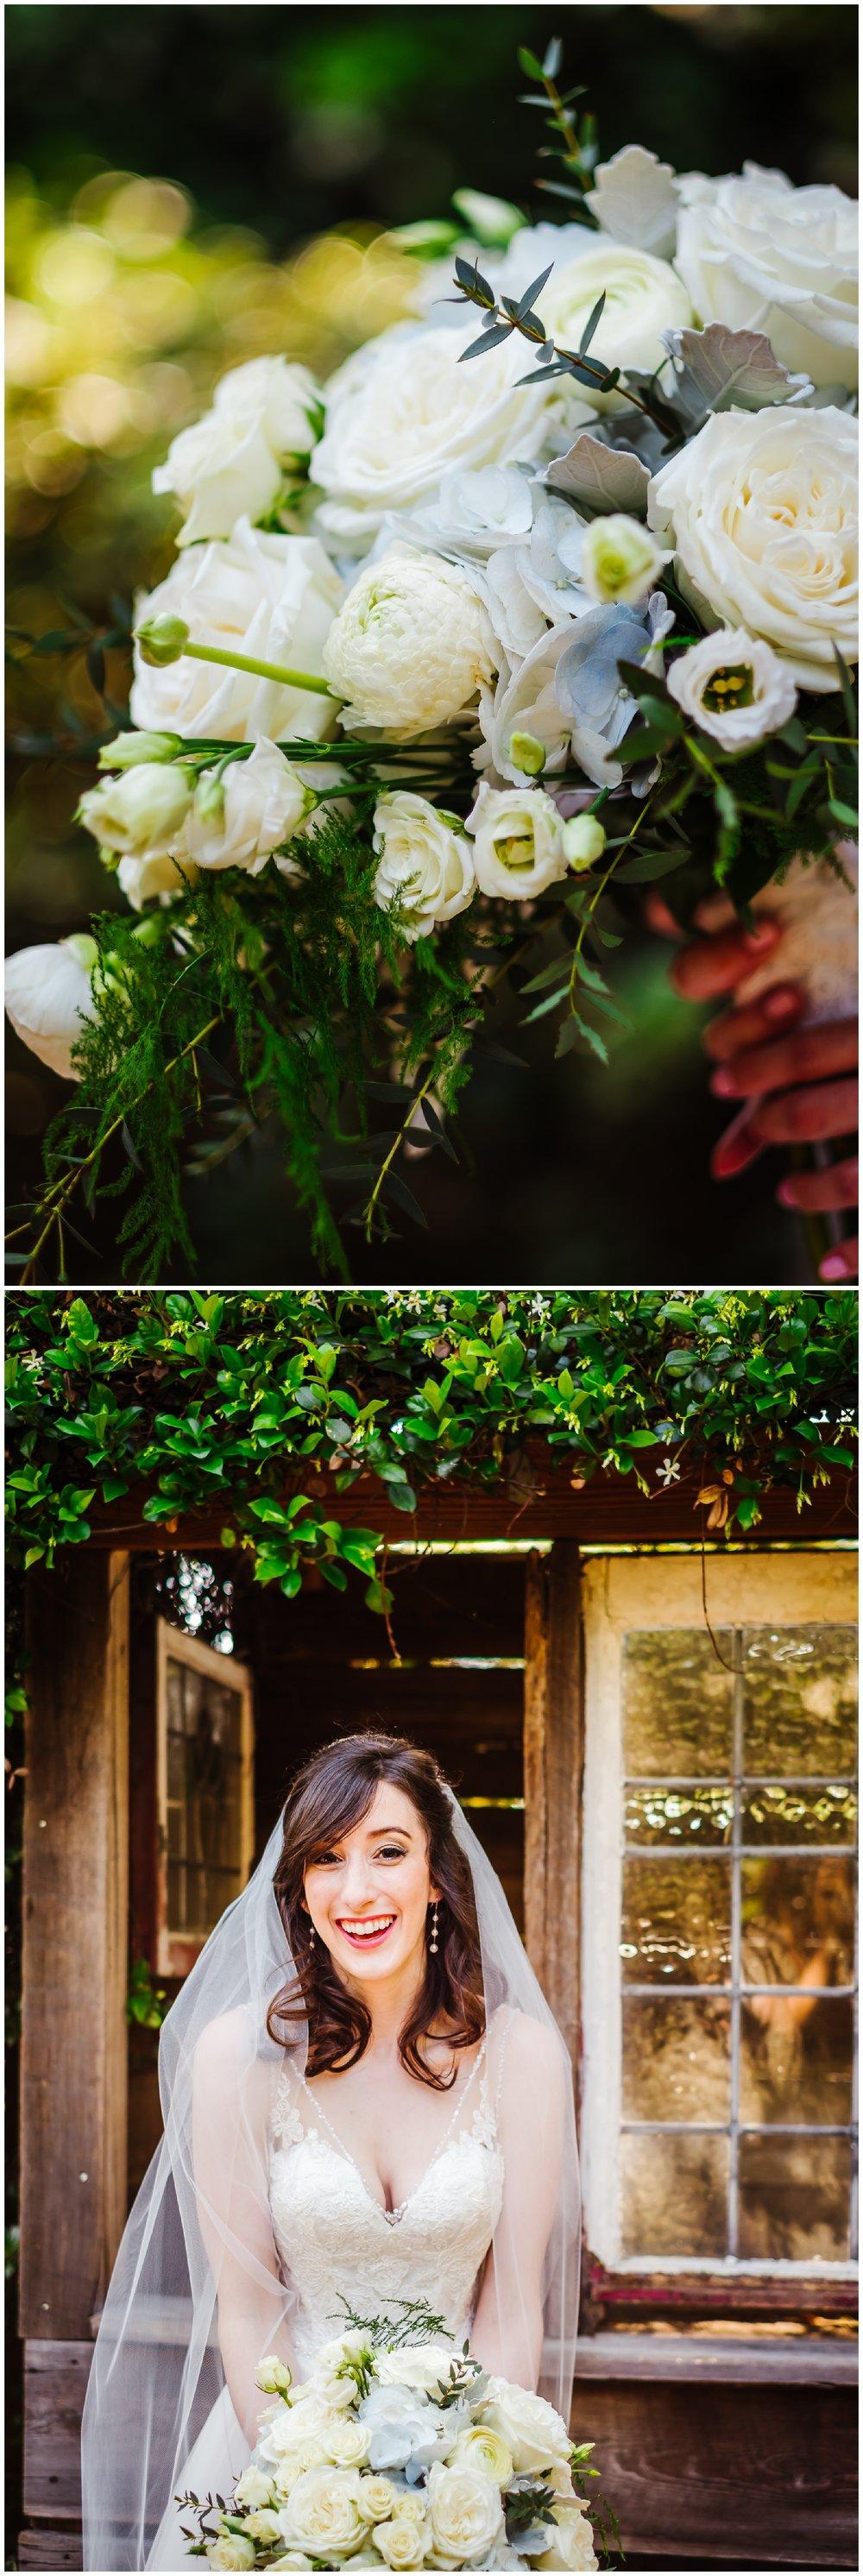 cross-creek-ranch-tampa-wedding-photographer-lush-green-white-florals_0019.jpg